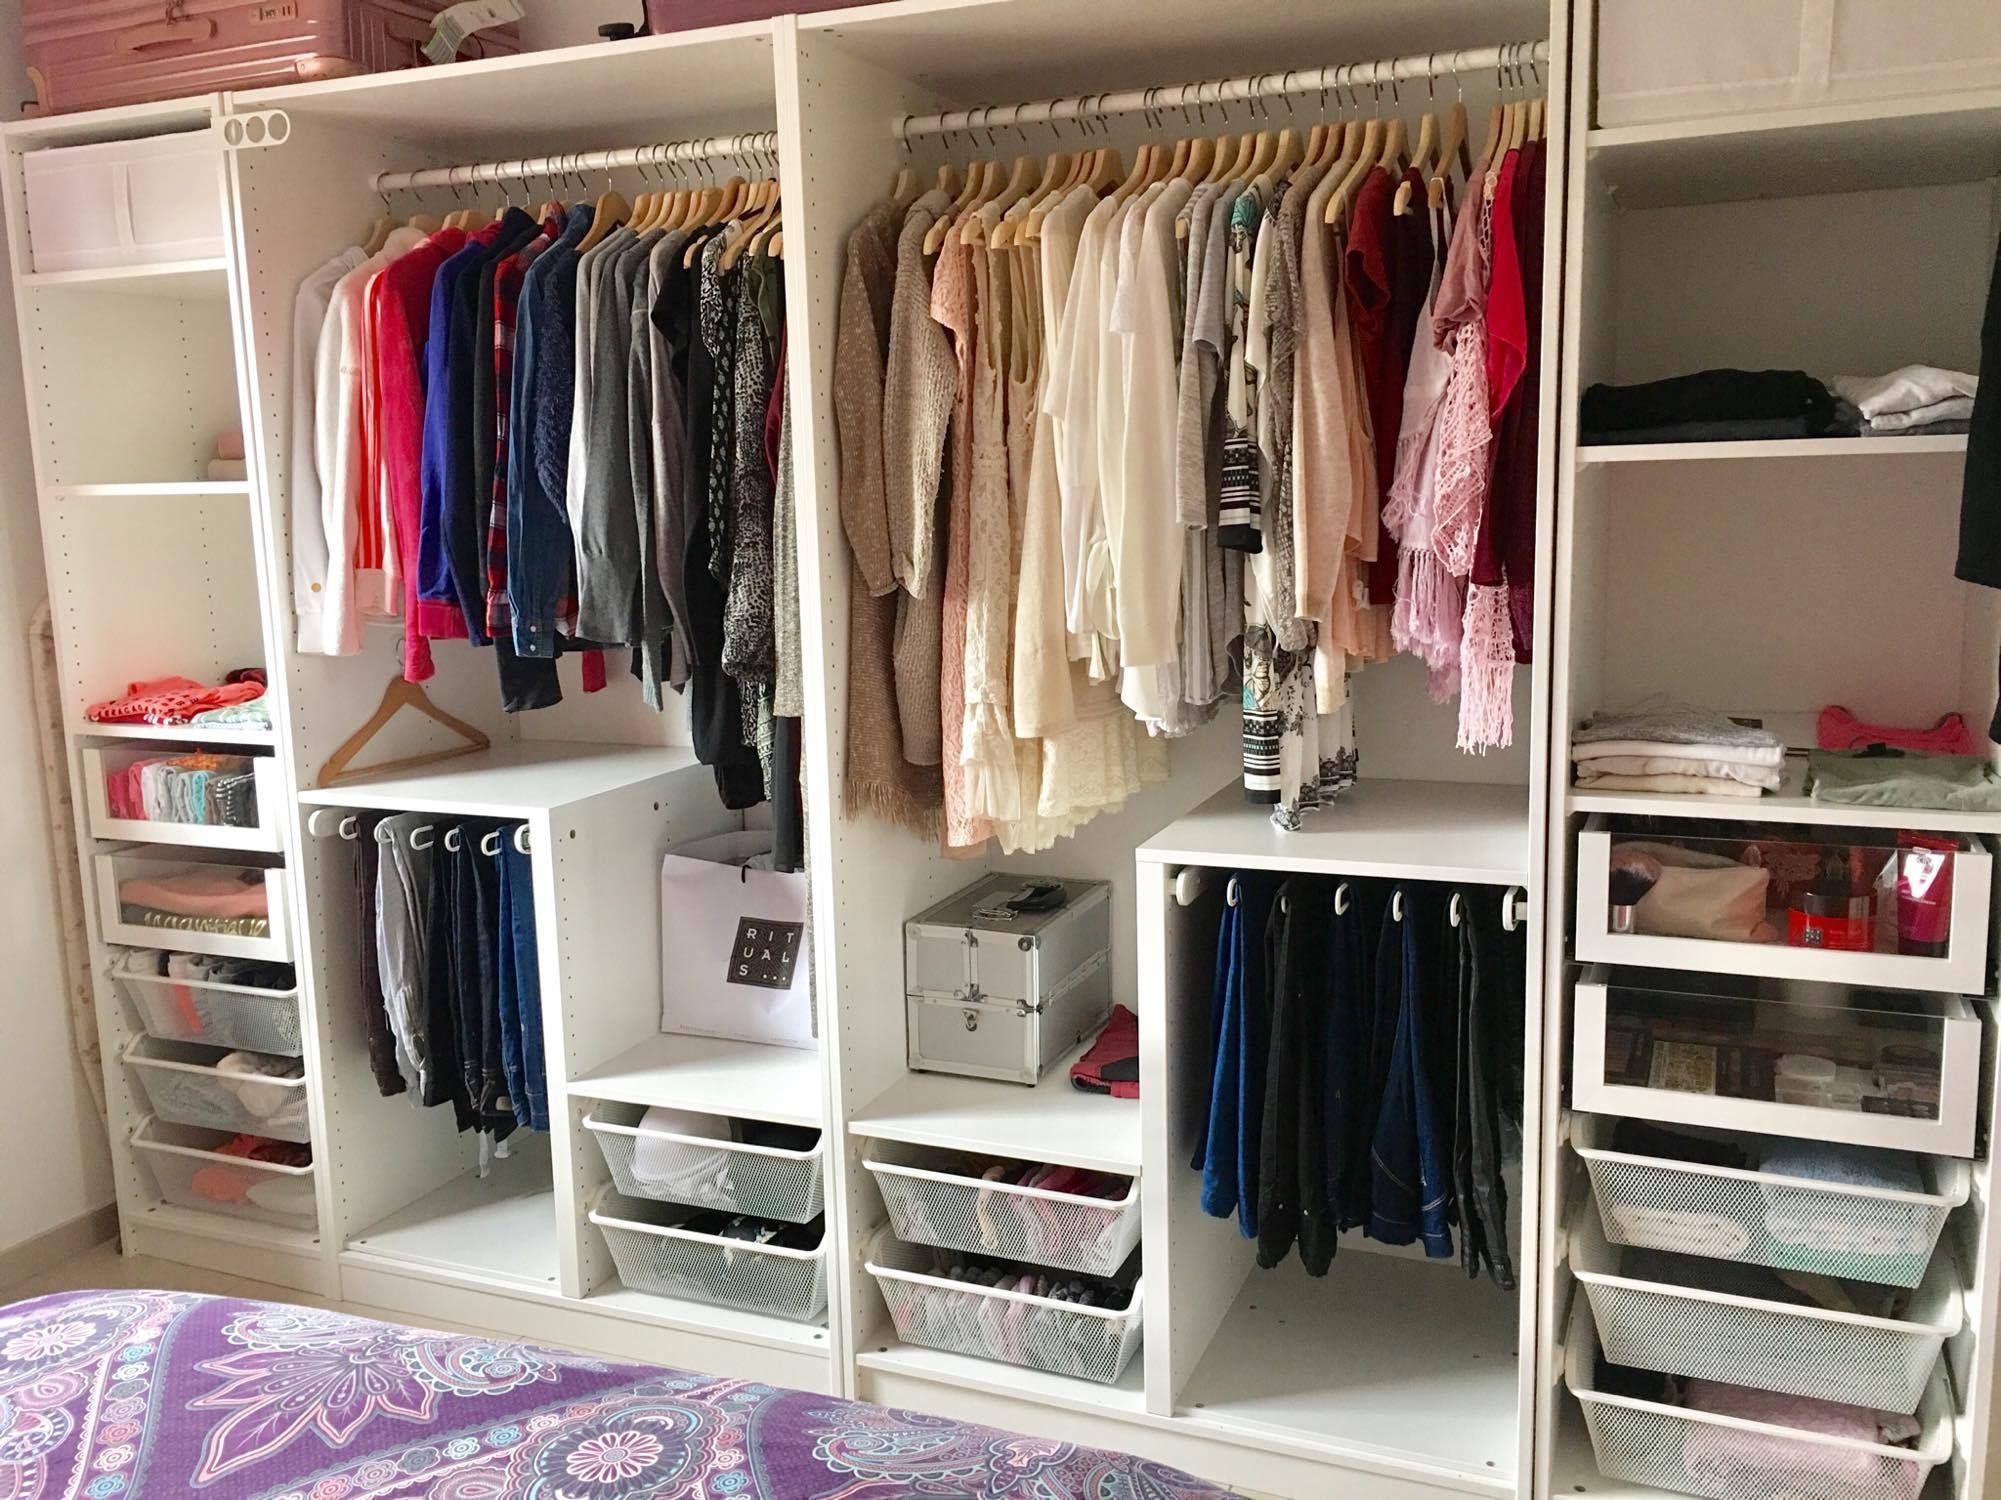 #Dressing, #chambre, #organisation, #rangement #penderie   Organisation maison, Penderie, Dressing